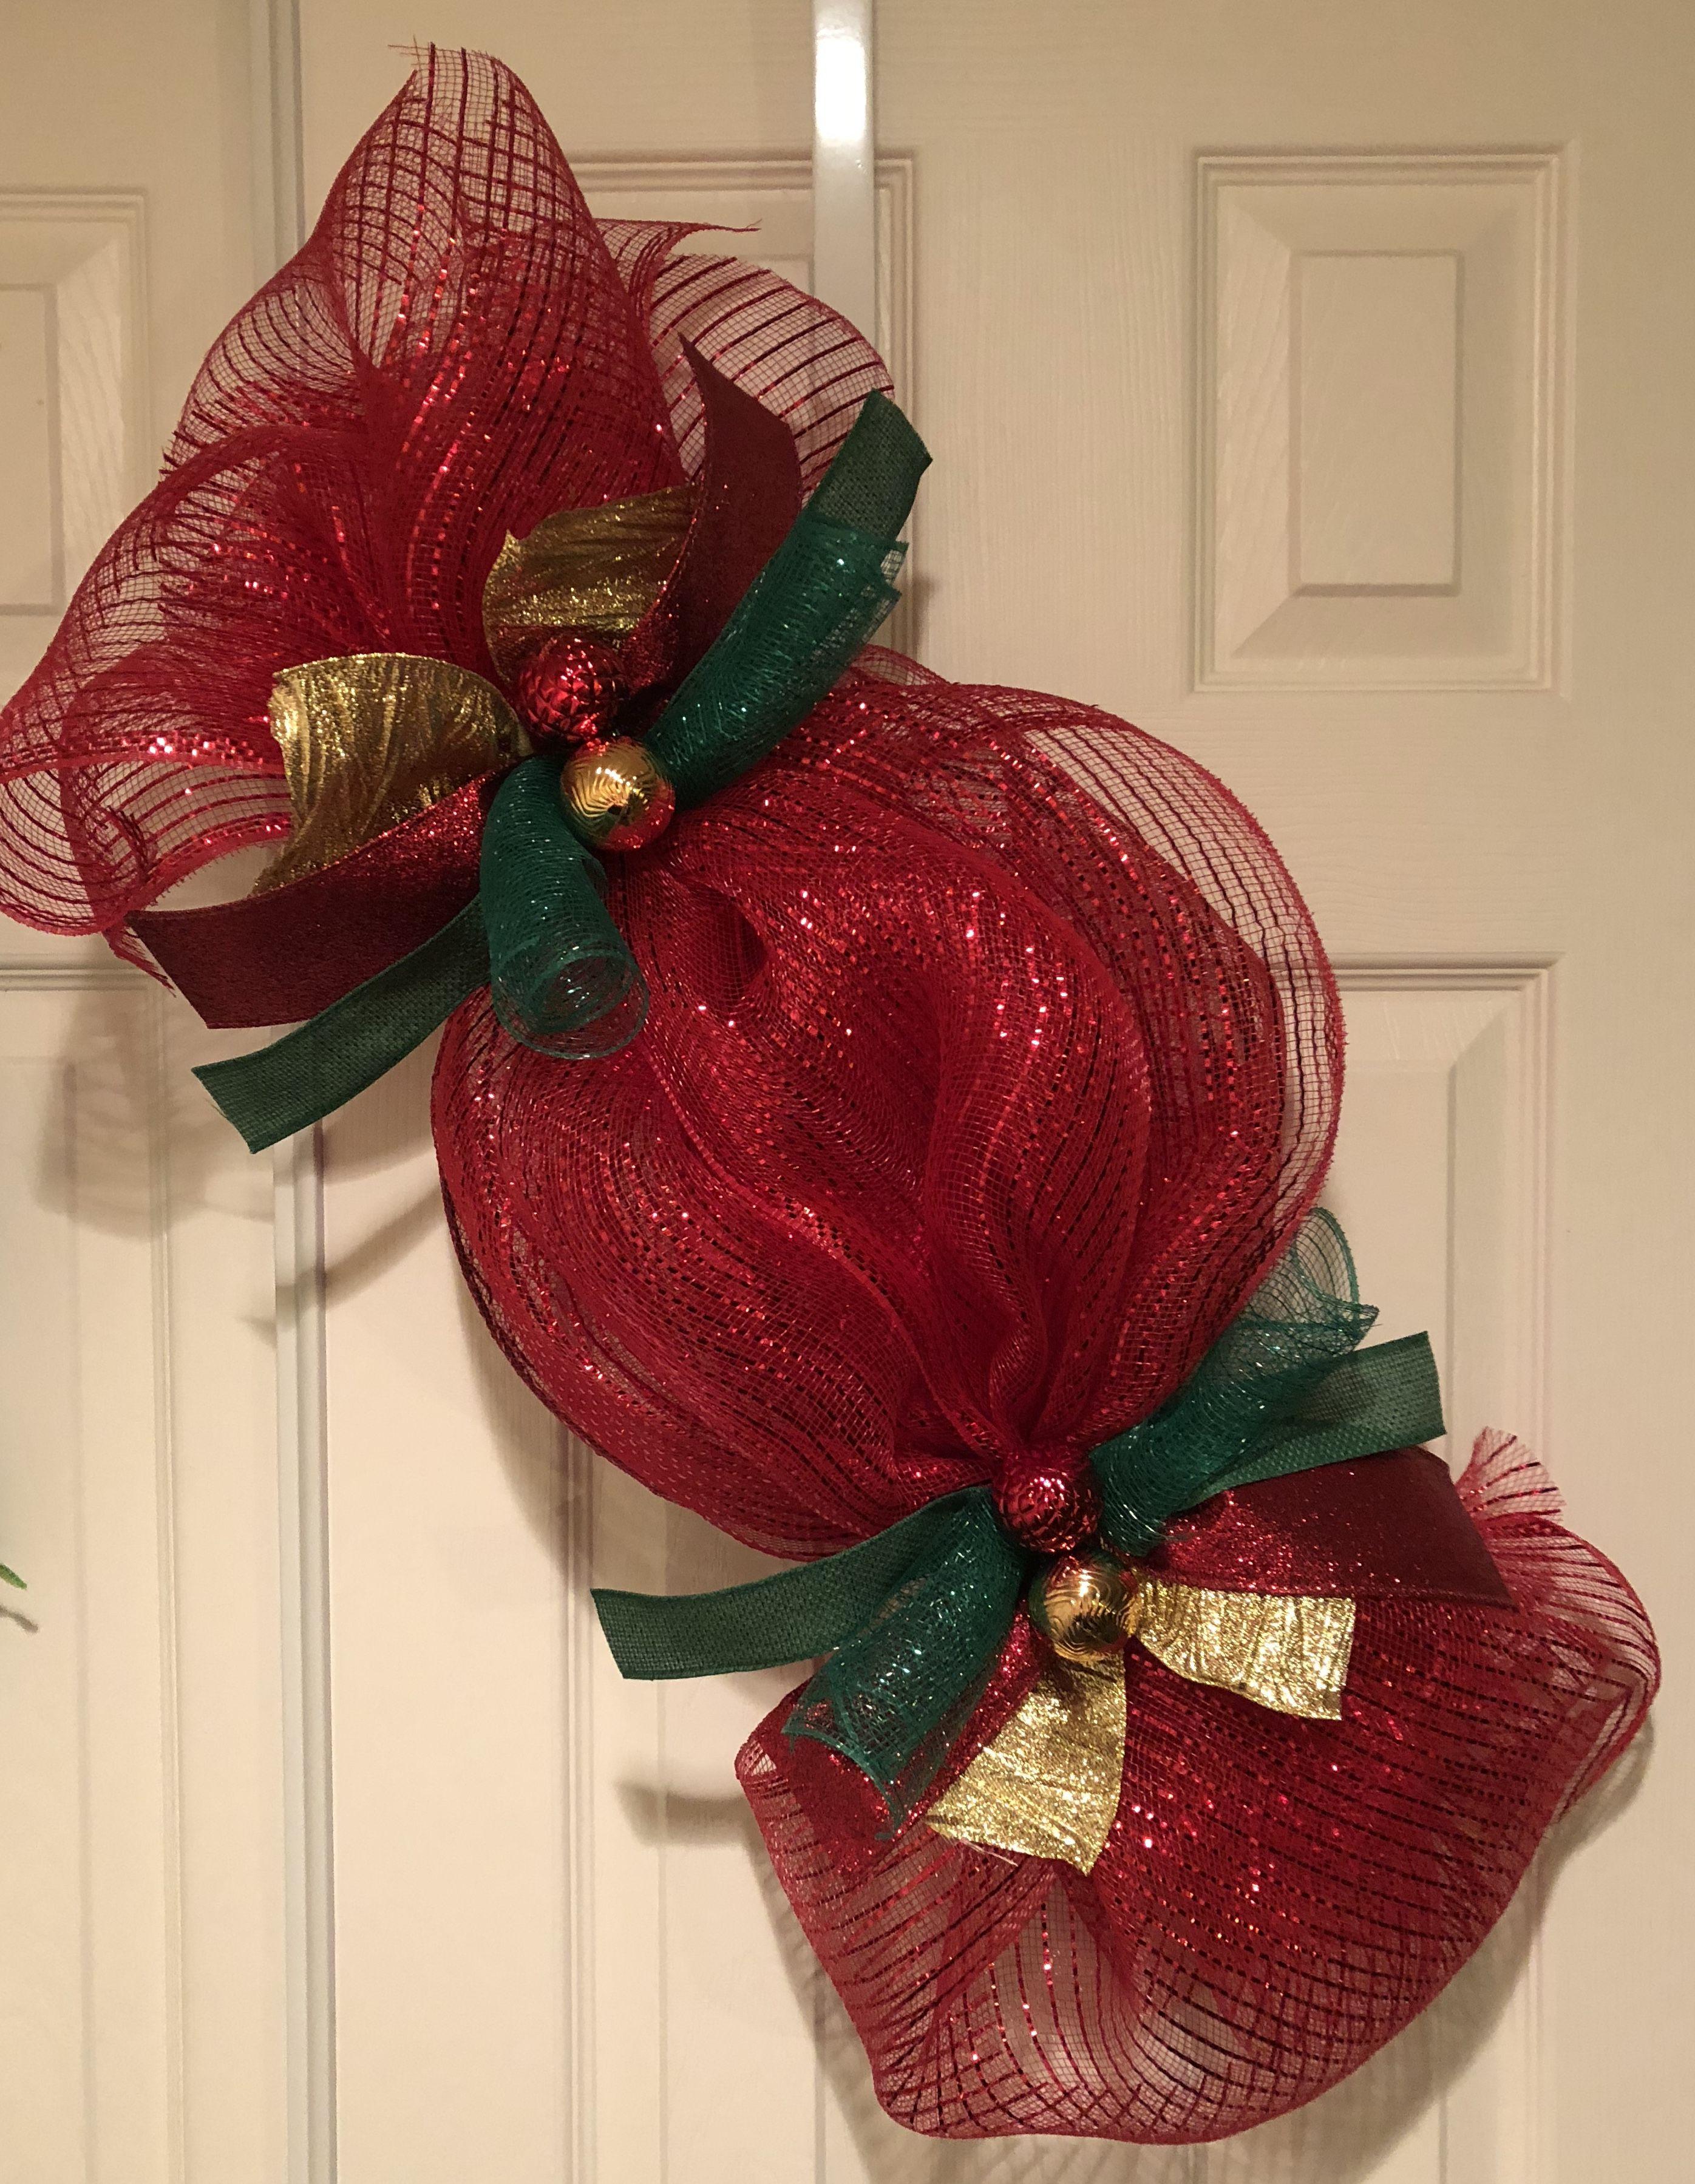 Pin by So Very Keri on wreaths Pinterest